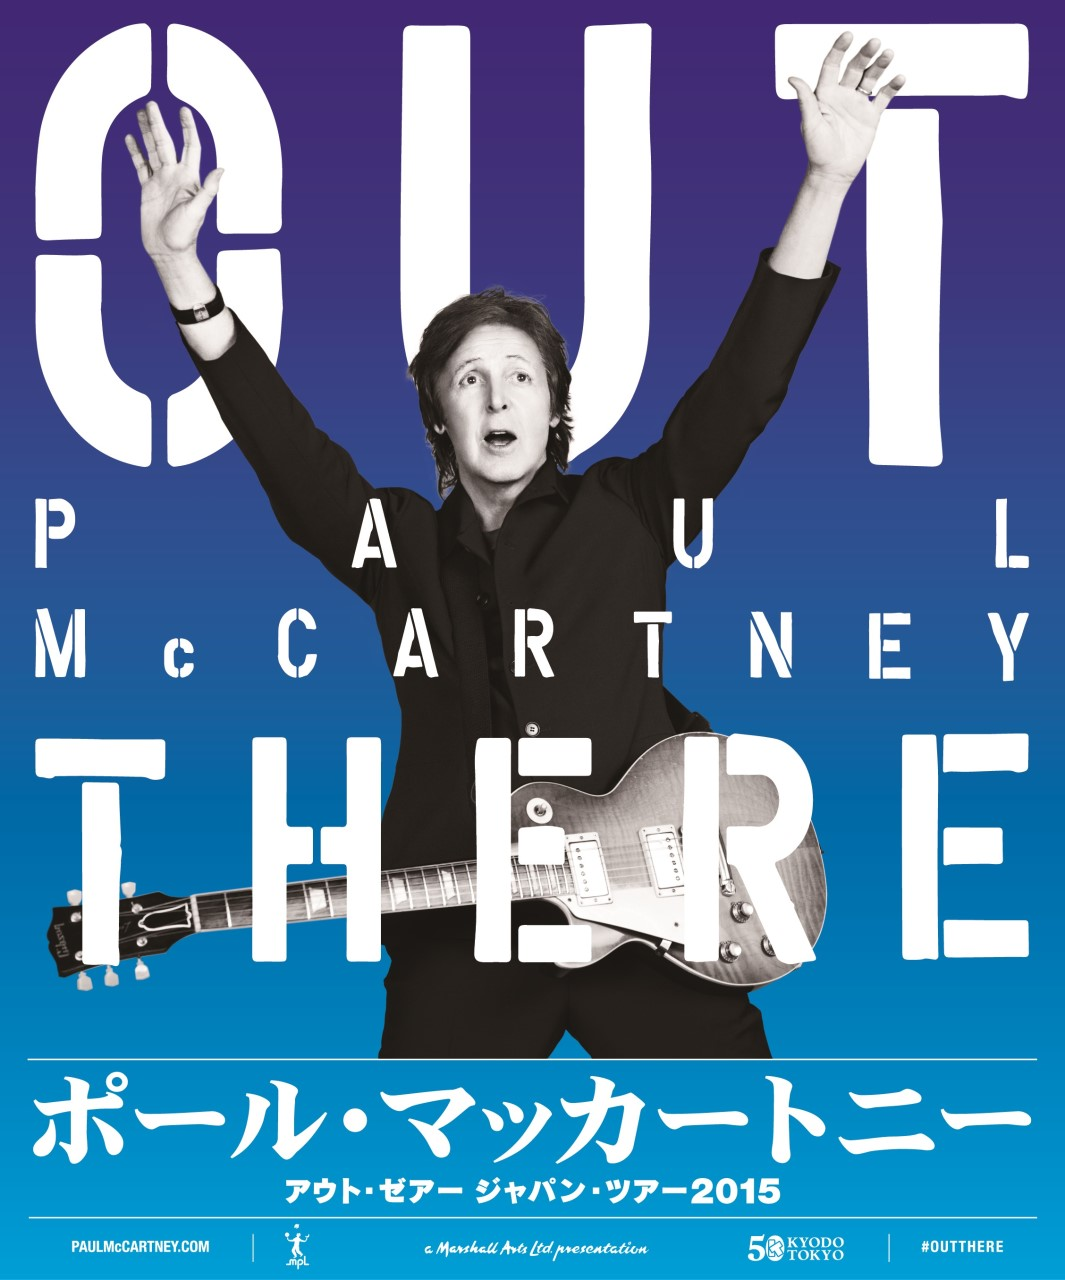 PAUL McCARTNEY OUT THERE JAPAN TOUR2015 武道館公演当落結果_b0042308_19165038.jpg